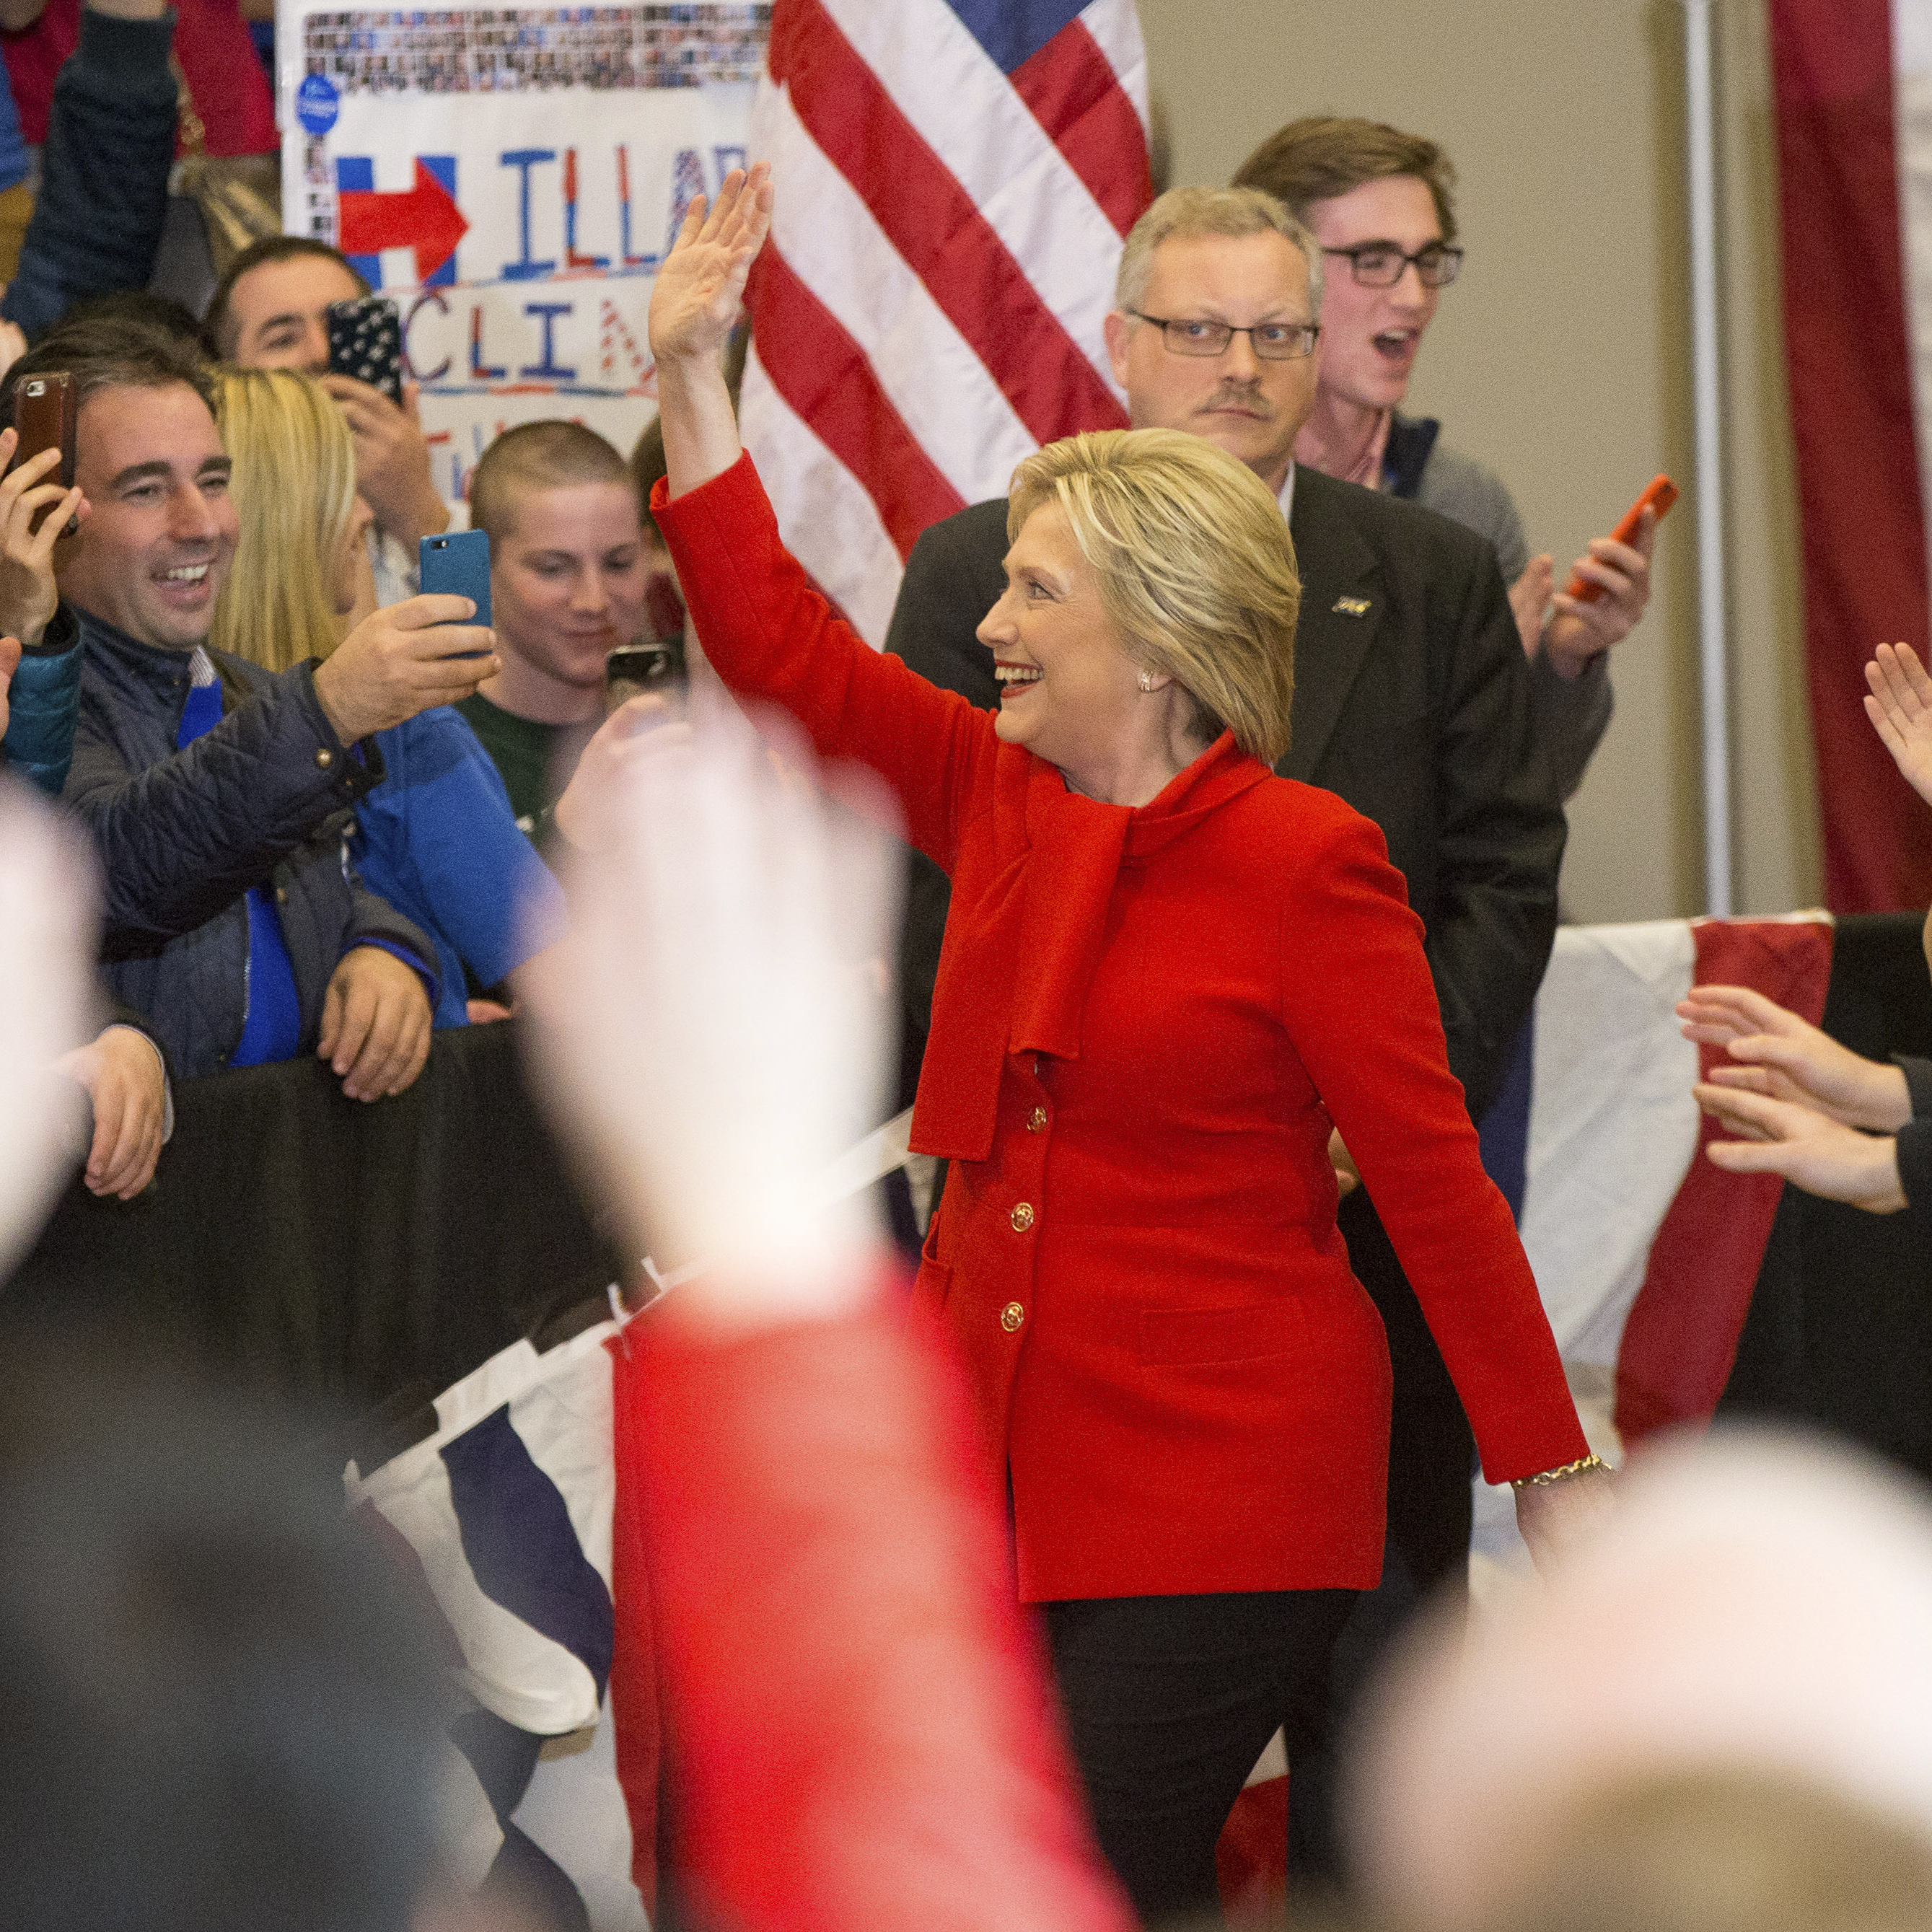 Cruz Deals Trump A Setback In Iowa; Clinton Narrowly Edges Out Sanders